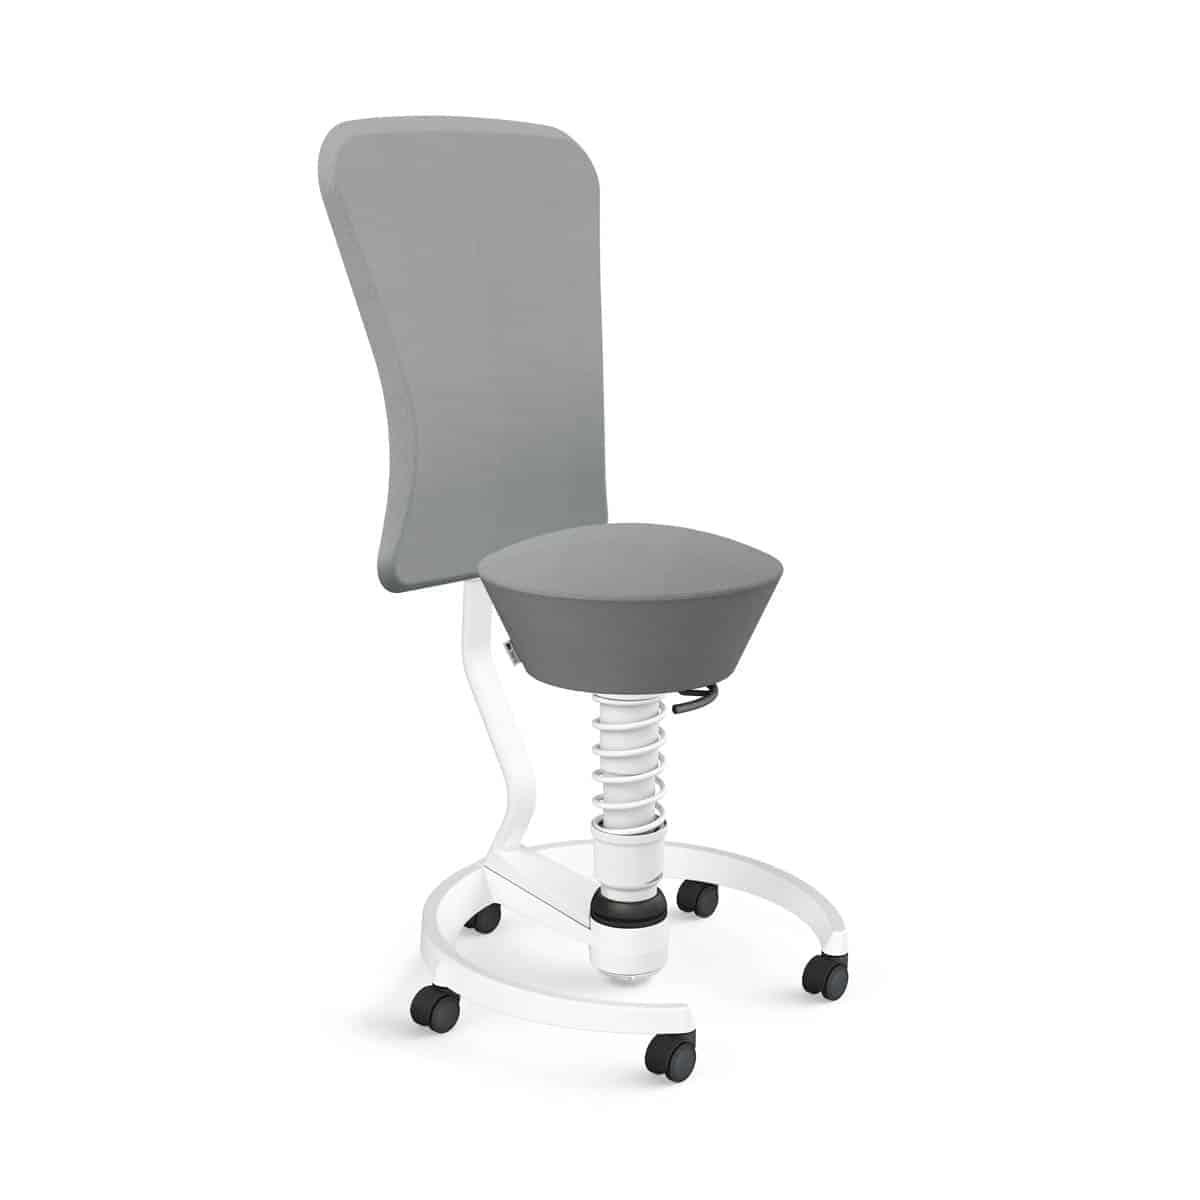 103 hb stwh wh se02 aeris swopper backrest castors hard floor standard white white select grey 02